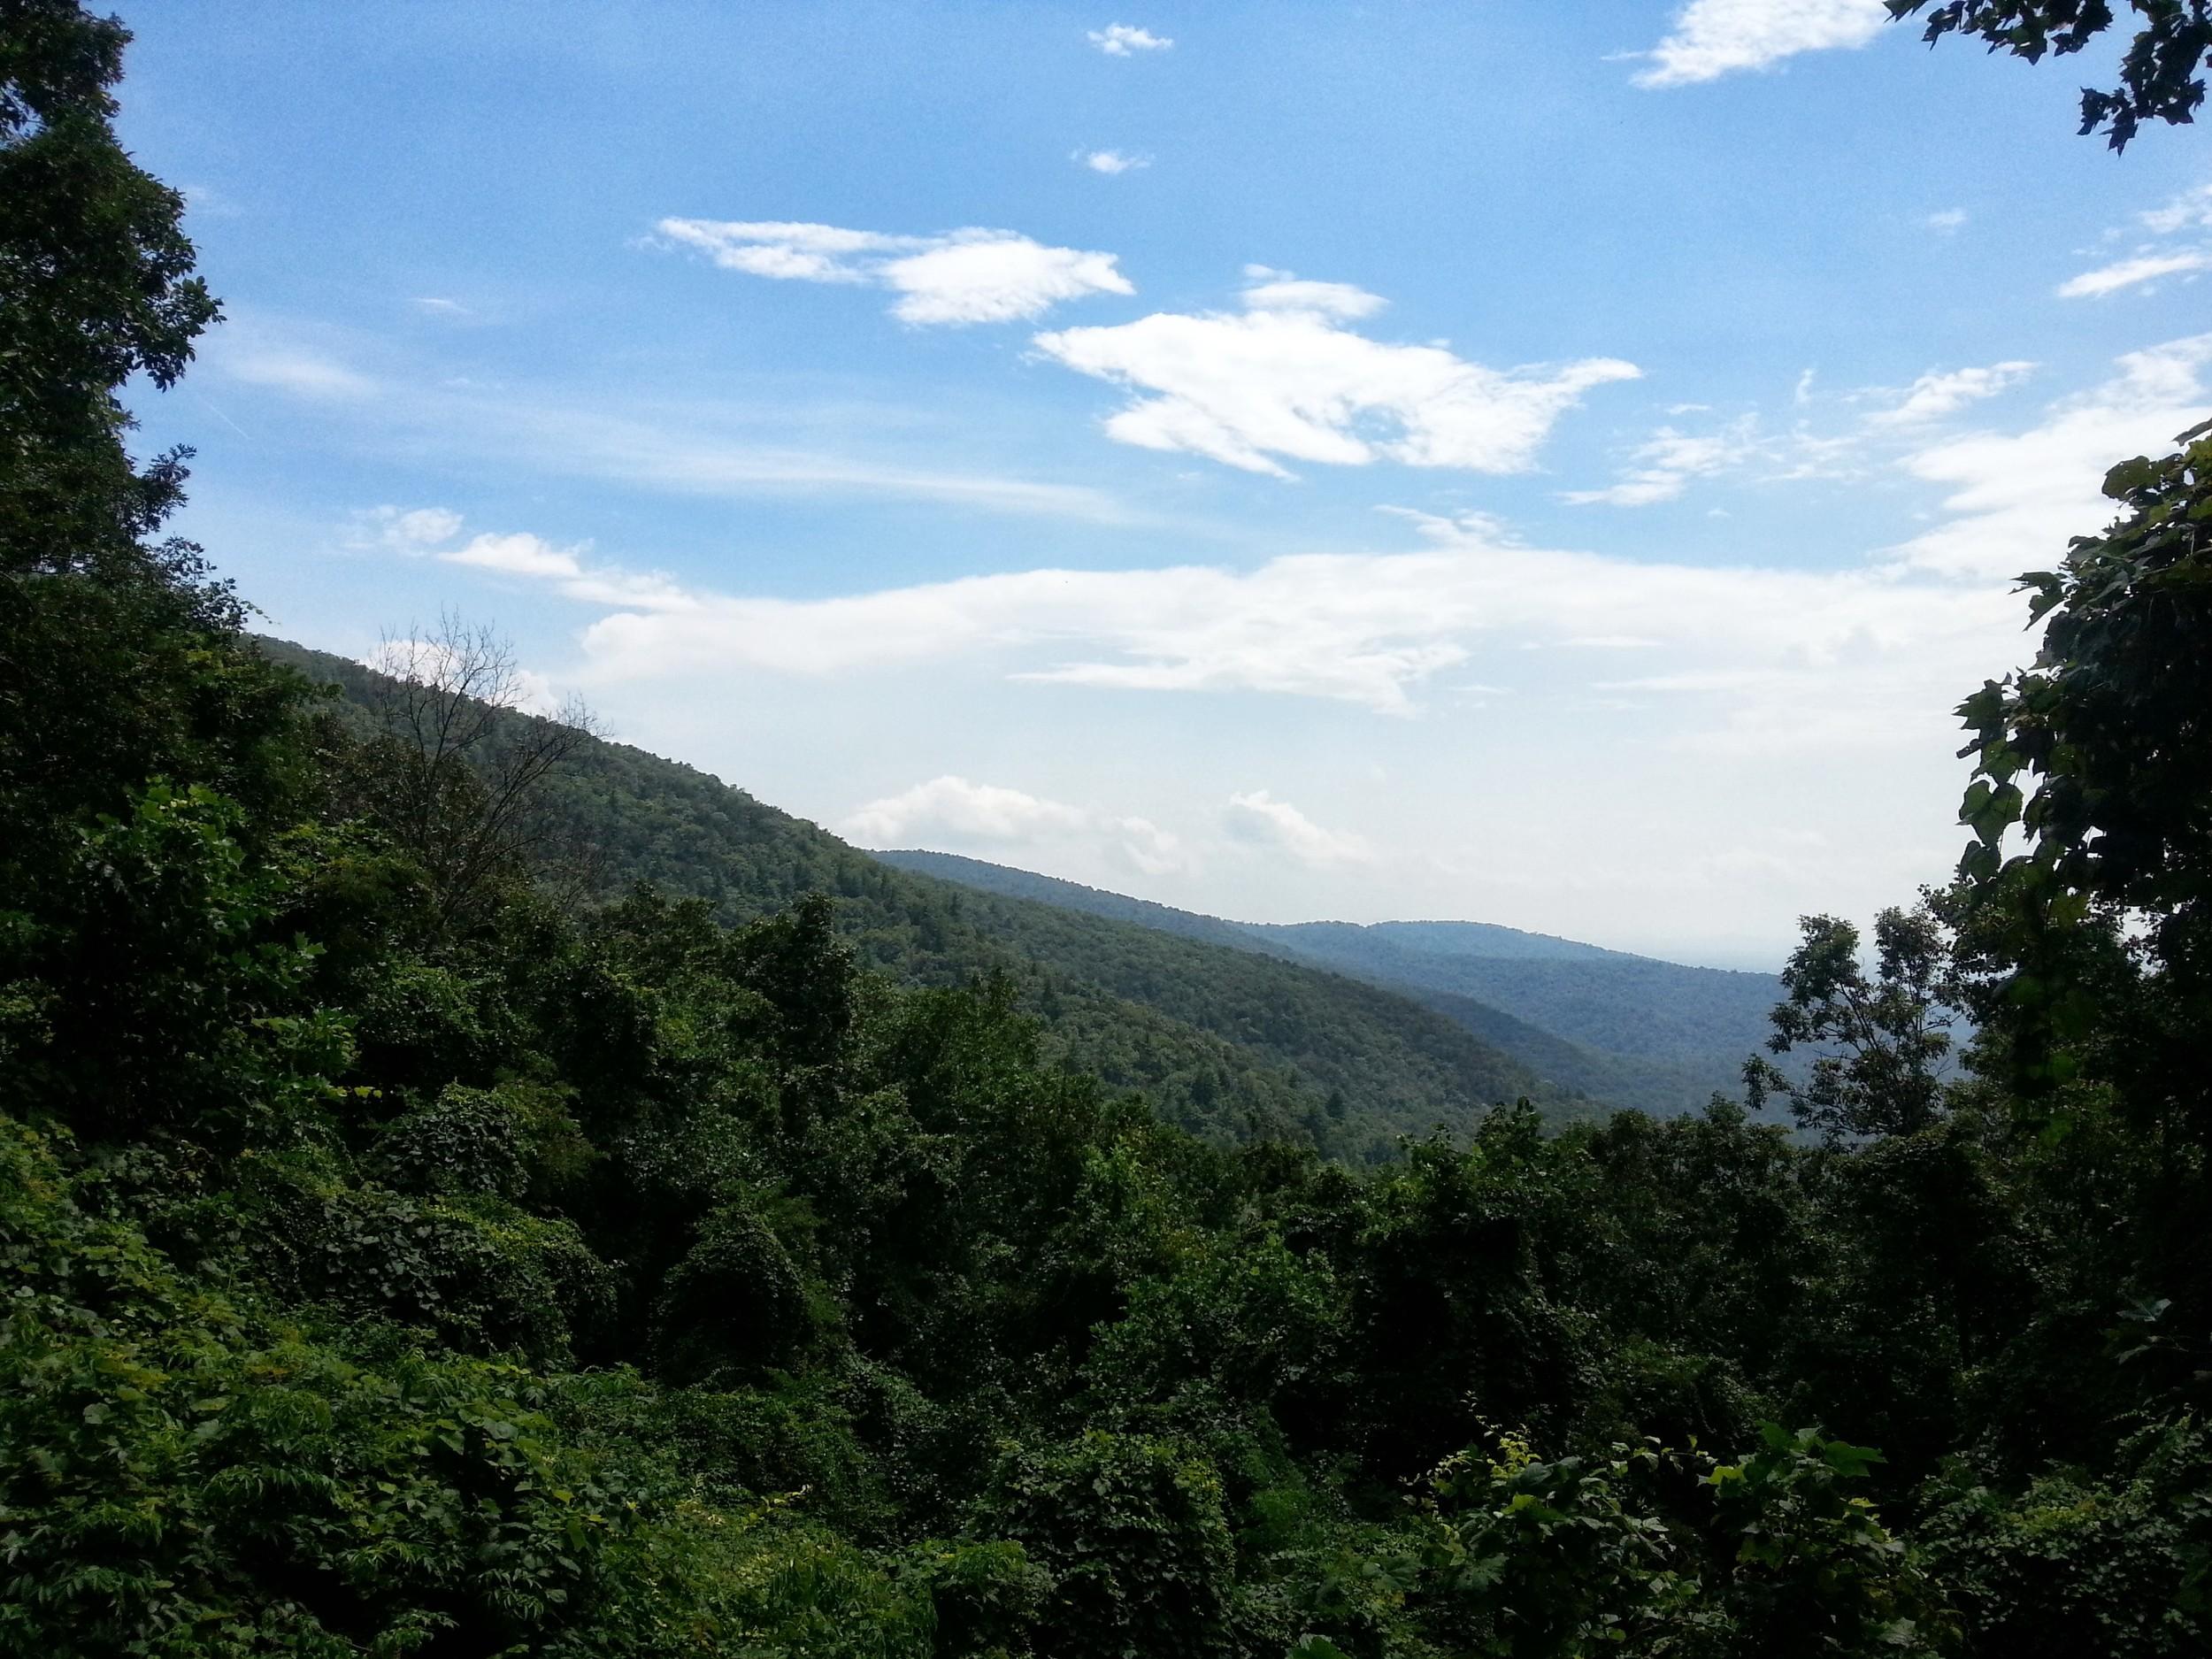 The view from Neels Gap/Walasi-Yi